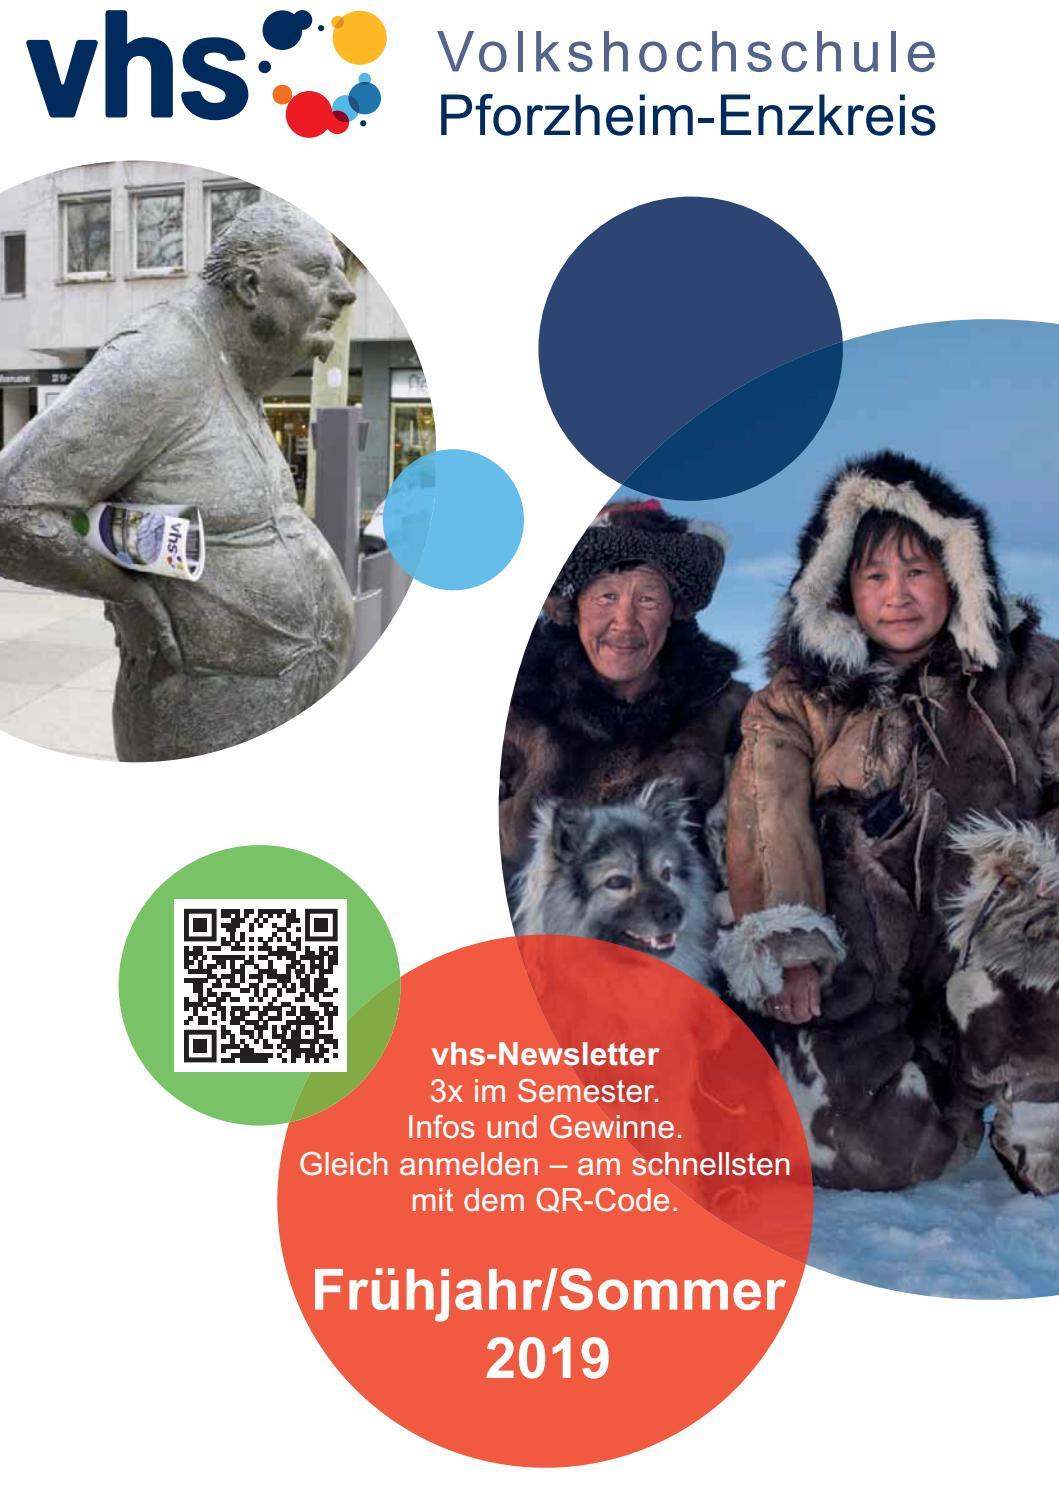 vhs Programm 2019 1 by Jupp Trogrlic - issuu 491fb07330